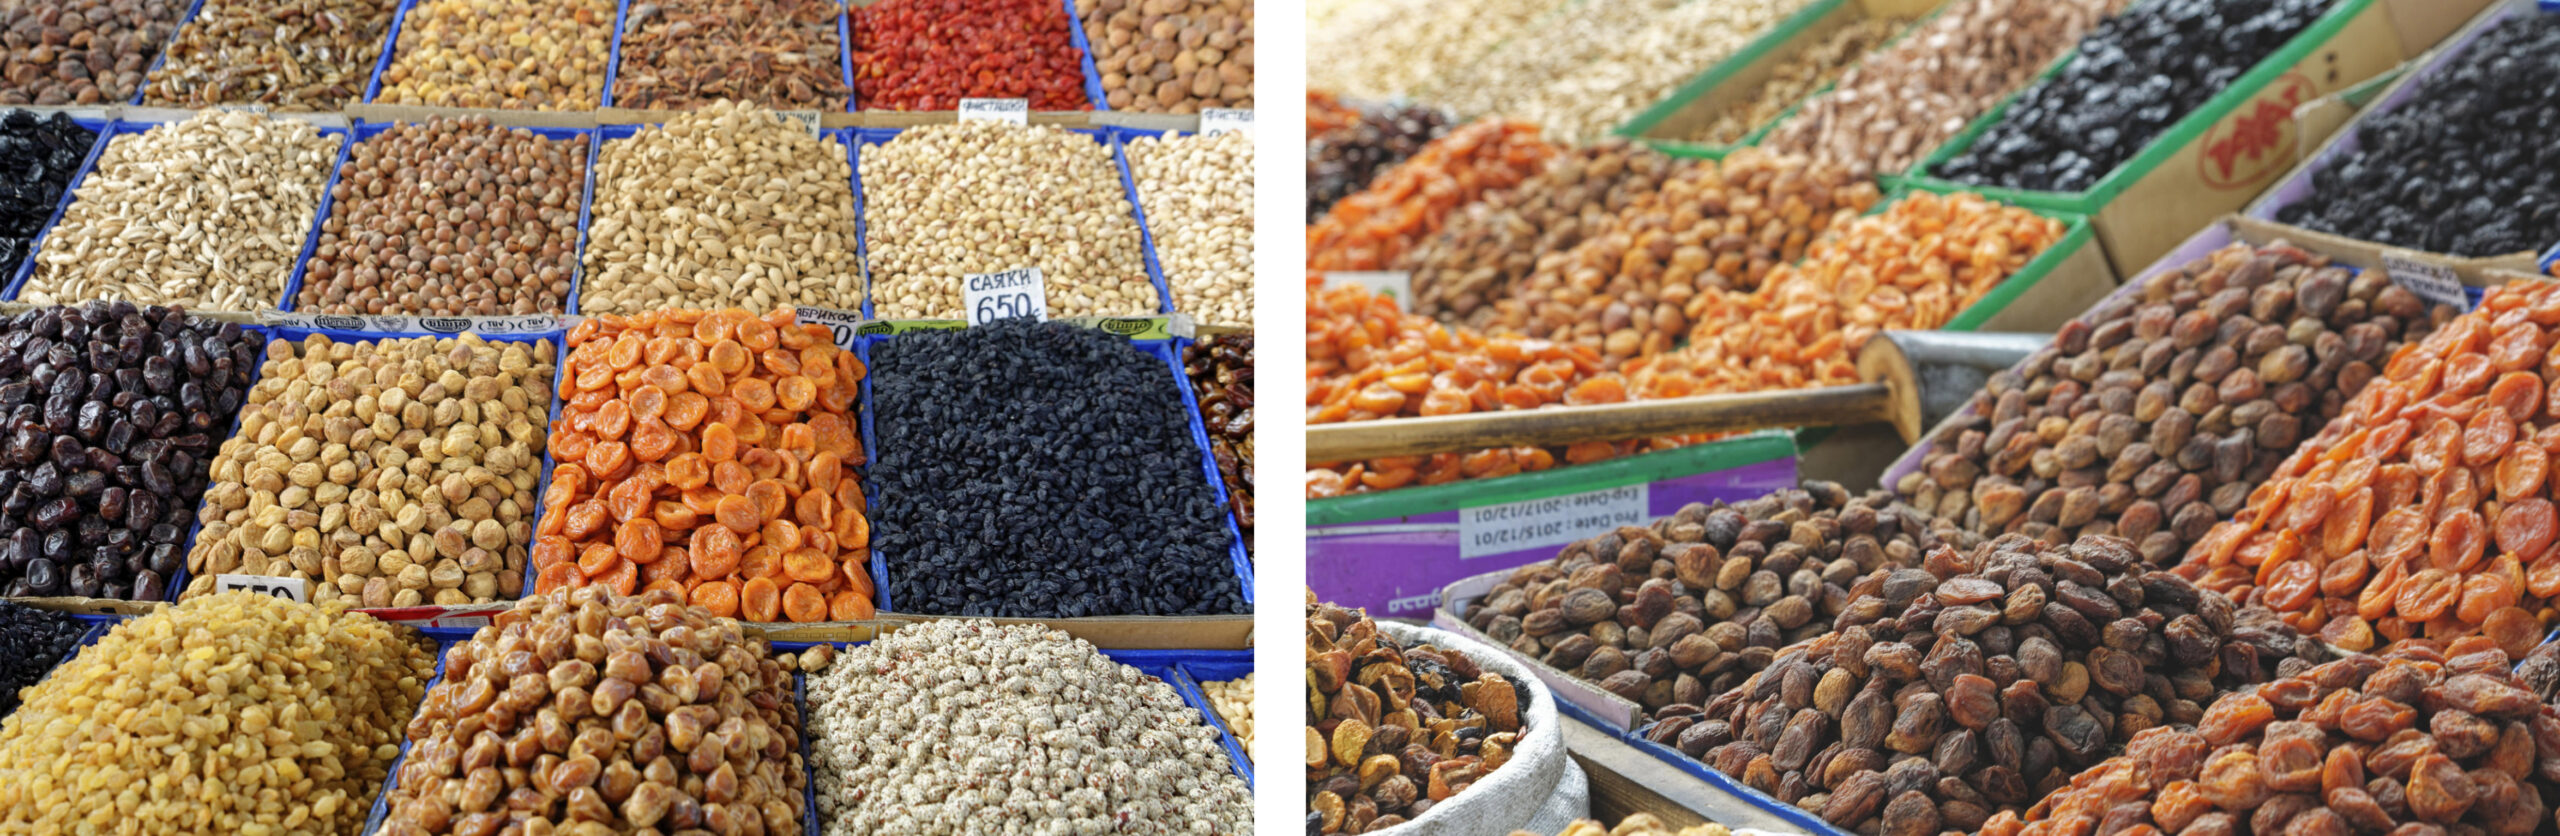 Fruits secs au bazar d'Och Kirghizstan